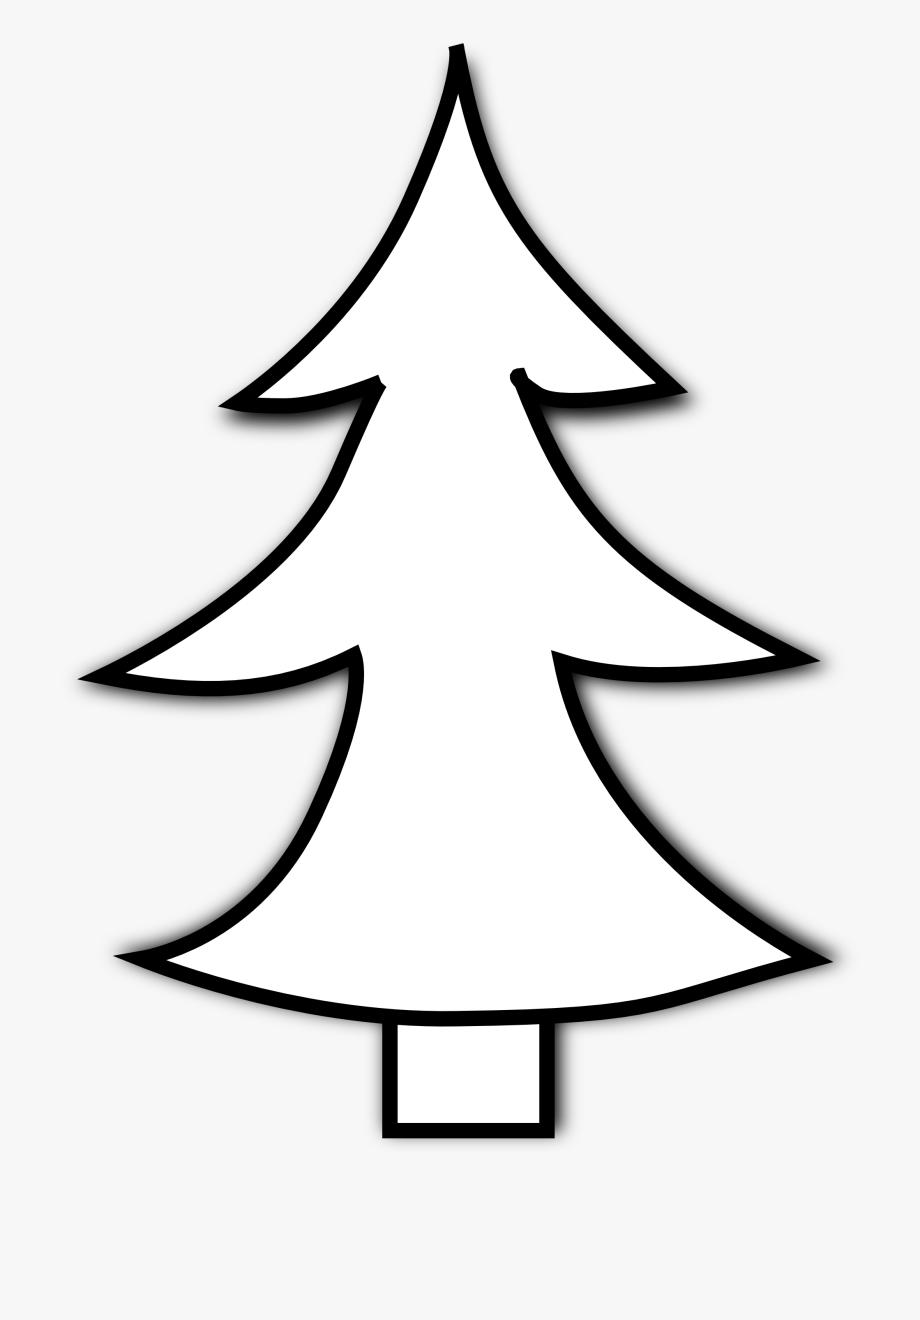 Christmas Tree Black And White Free Black And White.